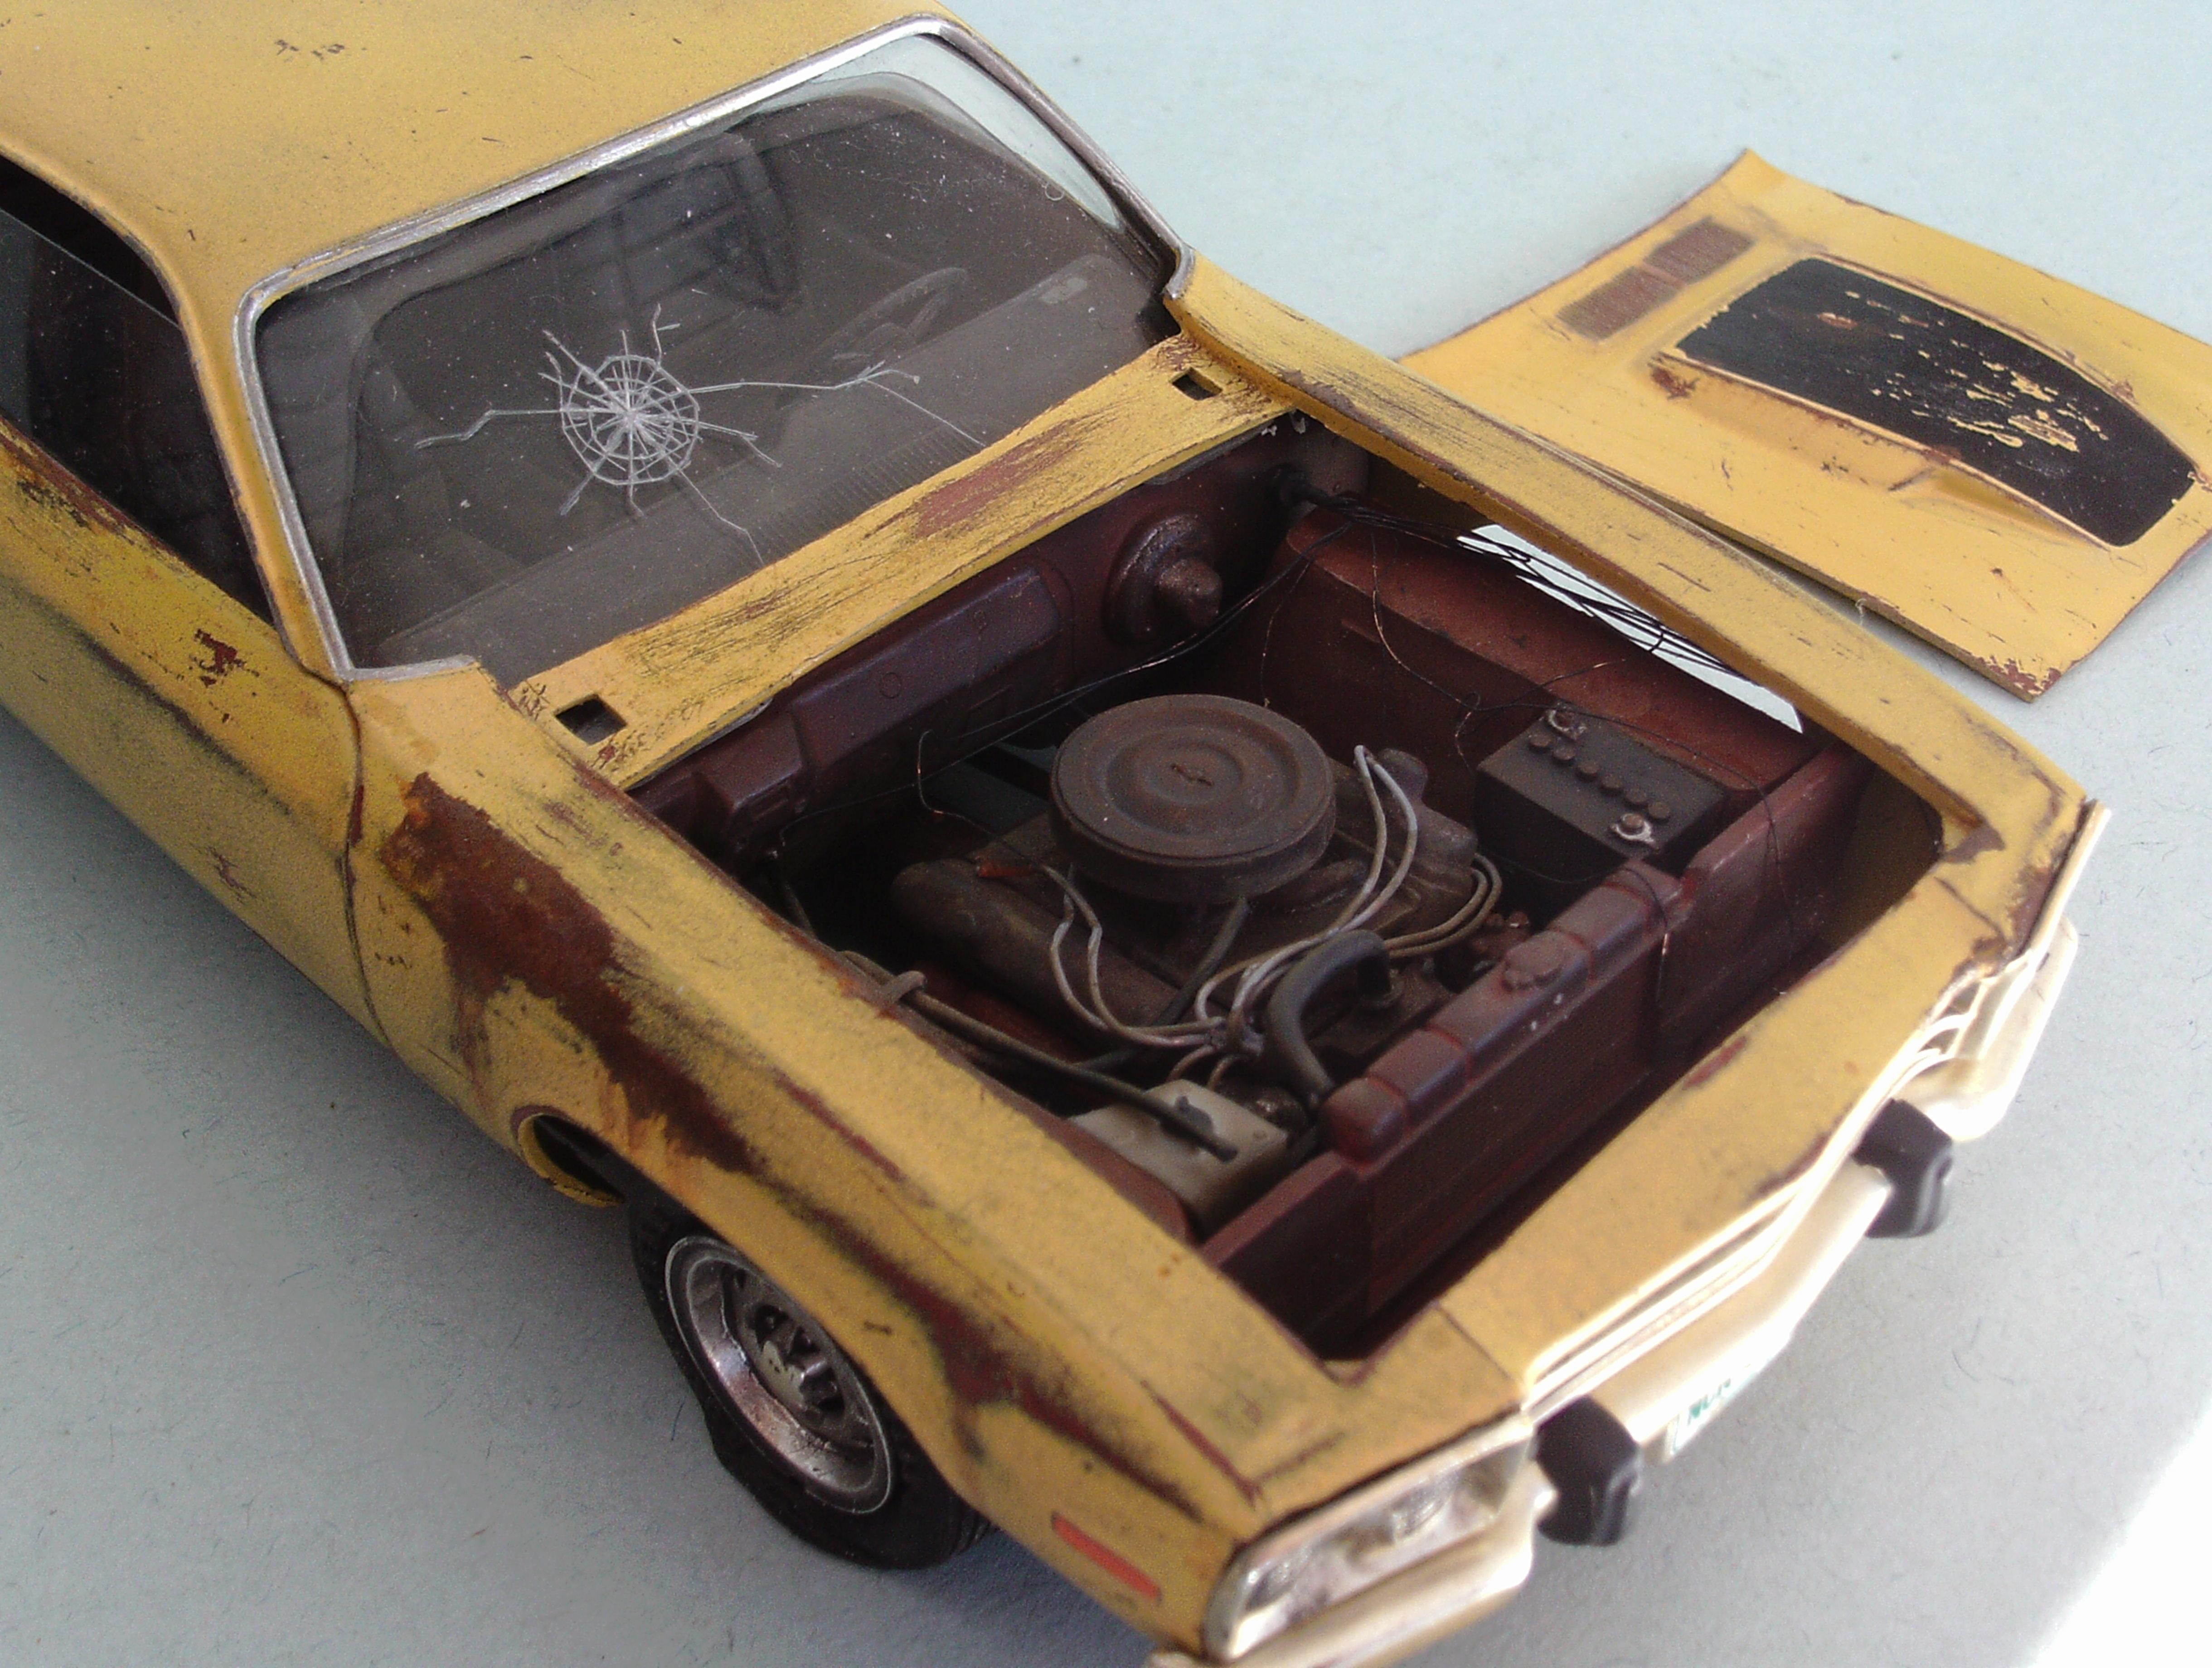 1974 Plymouth junker - Under Glass - Model Cars Magazine Forum